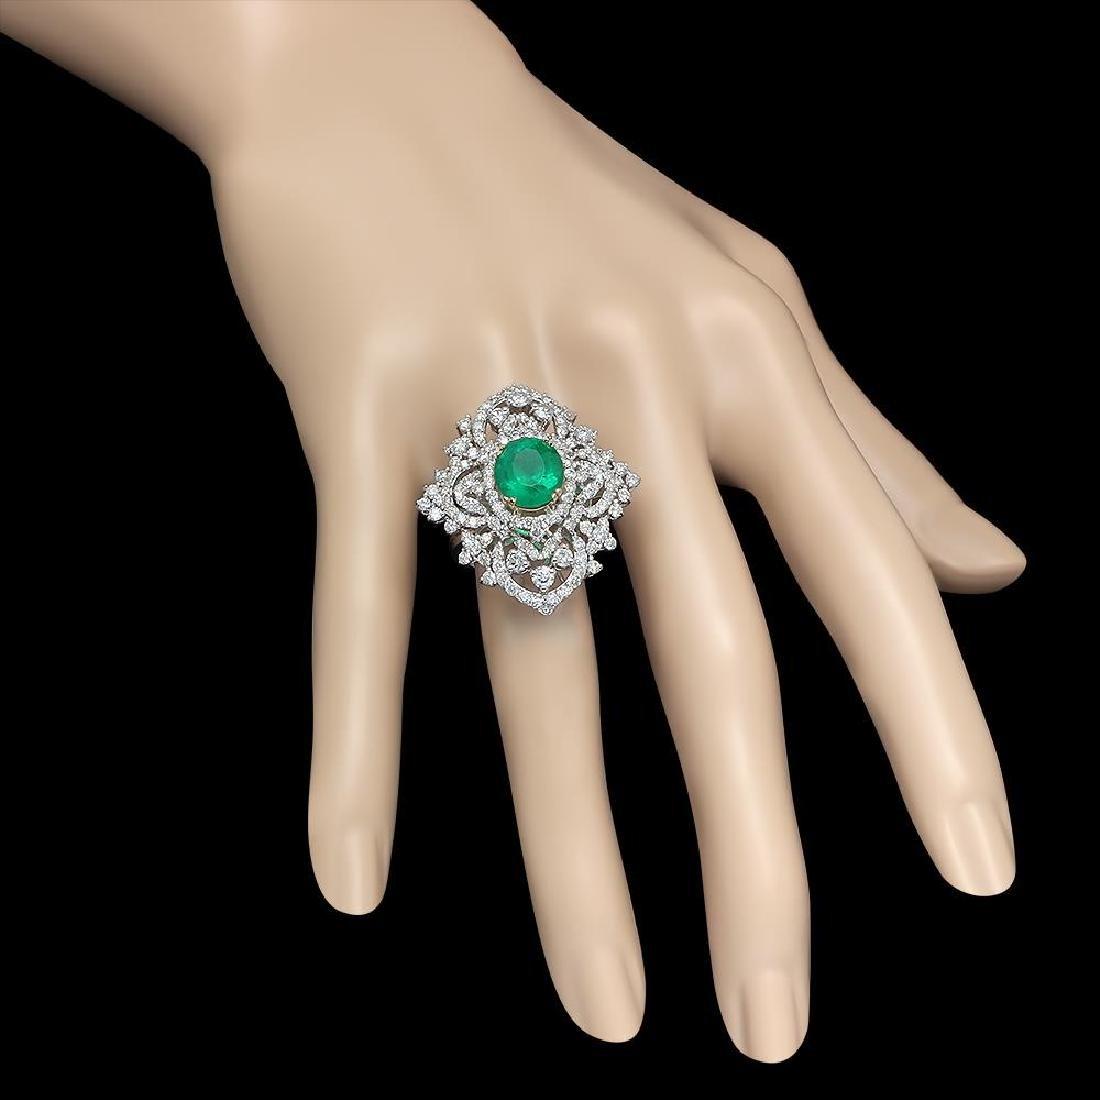 18K Gold 3.11 Emerald 3.22 Diamond Ring - 3